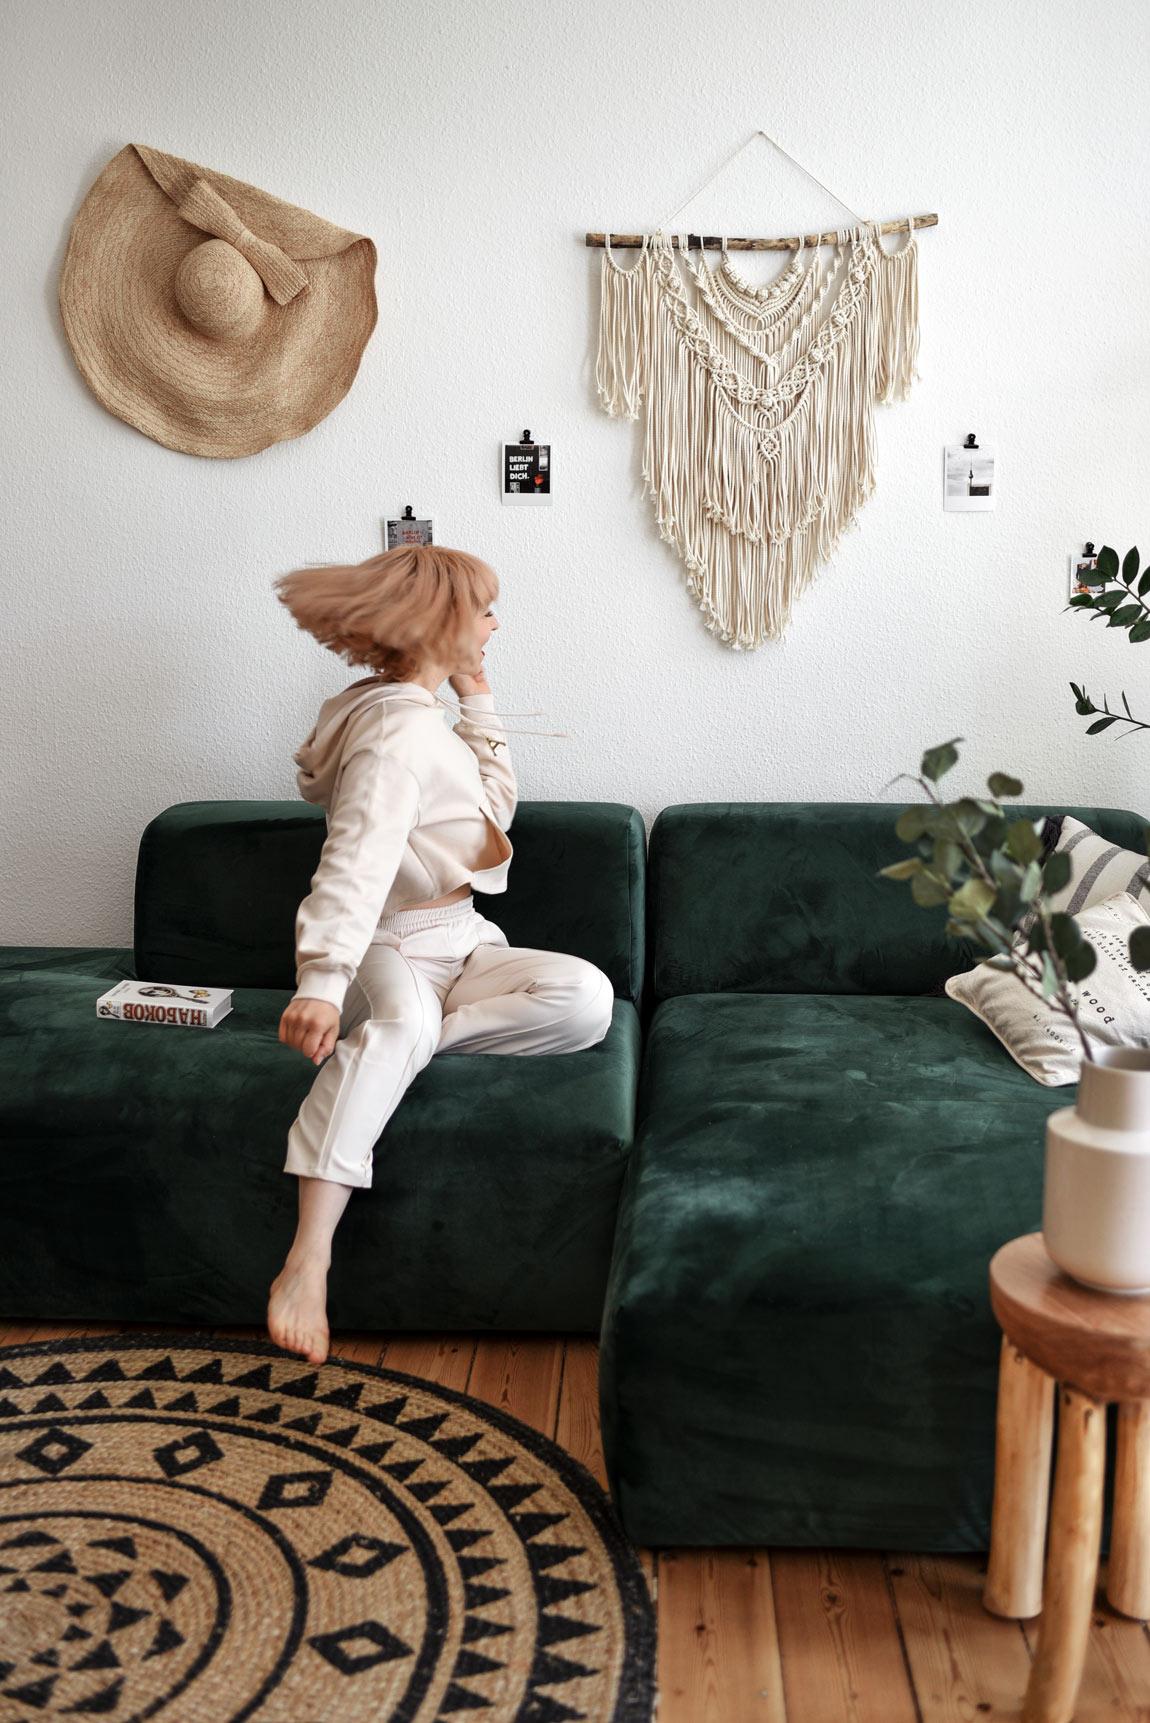 mycs, couch, samt, grün, green, berlin, sofa, interior, schlafsofa, wohnen, living, blogger, blog, boho, bohemian, pflanzen, altbau, einrichtung, deko, pinterest